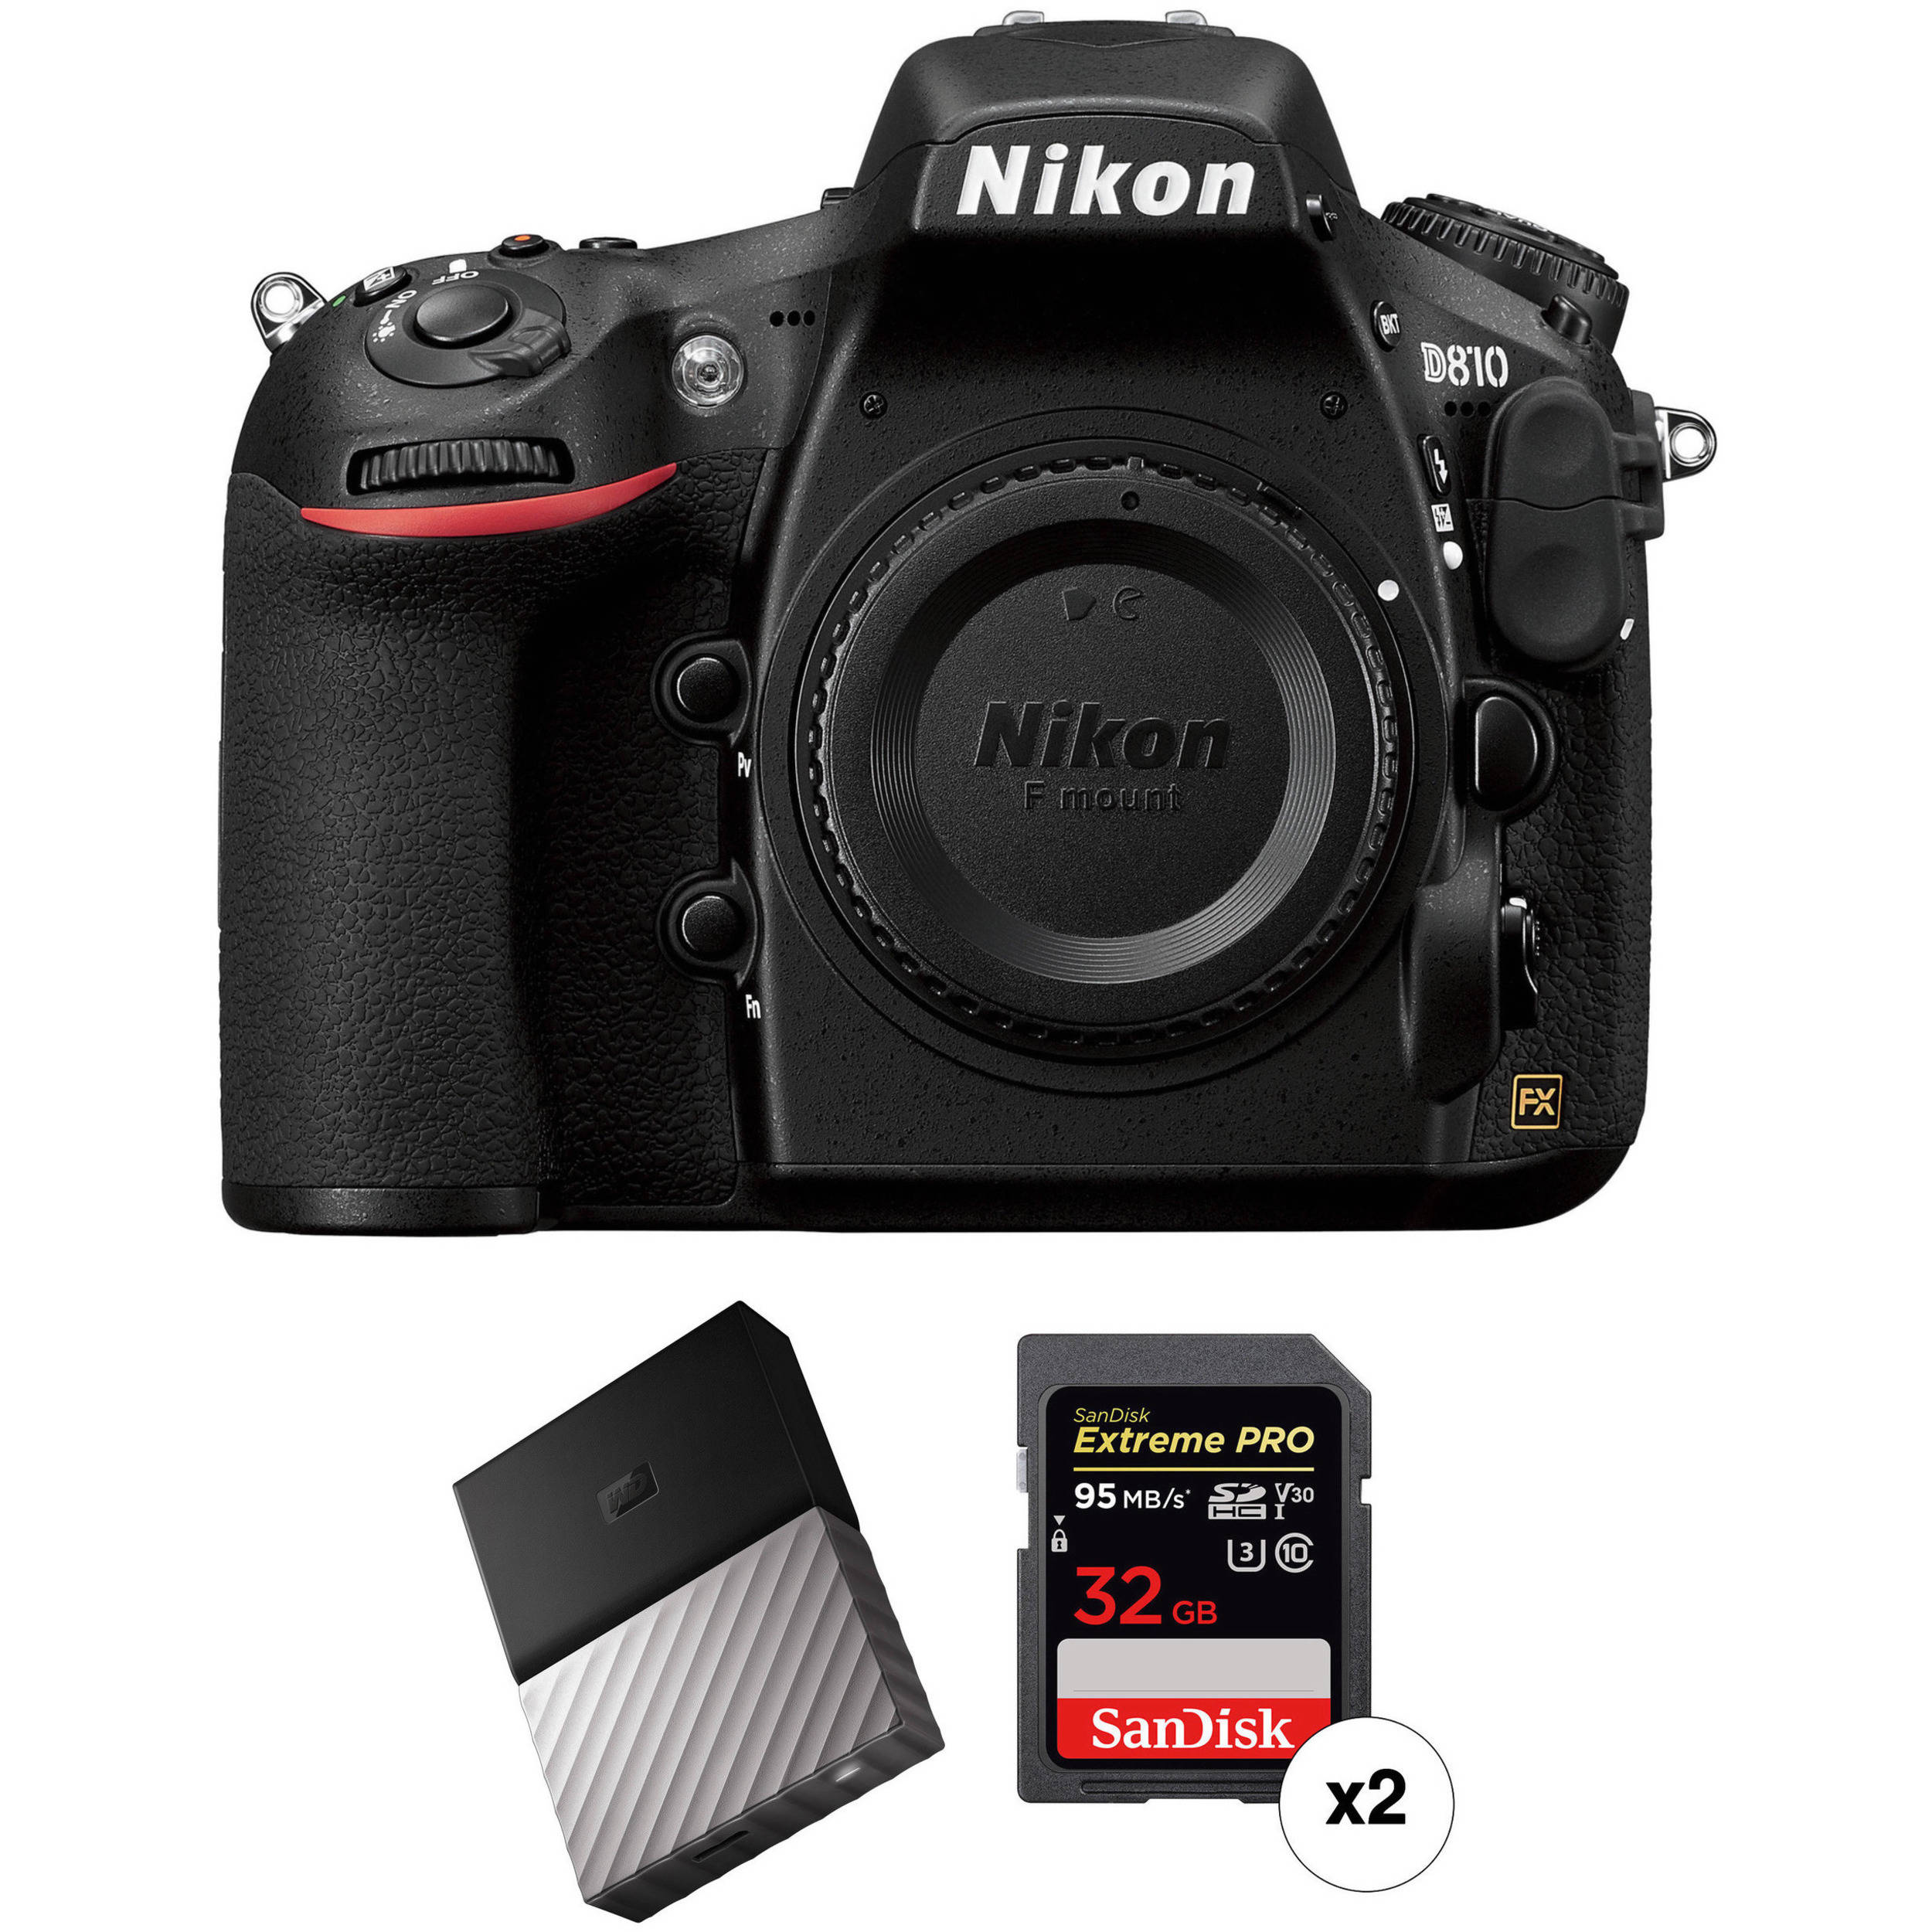 Camera Advantage Of Dslr Camera dslr cameras digital slr bh photo nikon d810 camera body with storage kit